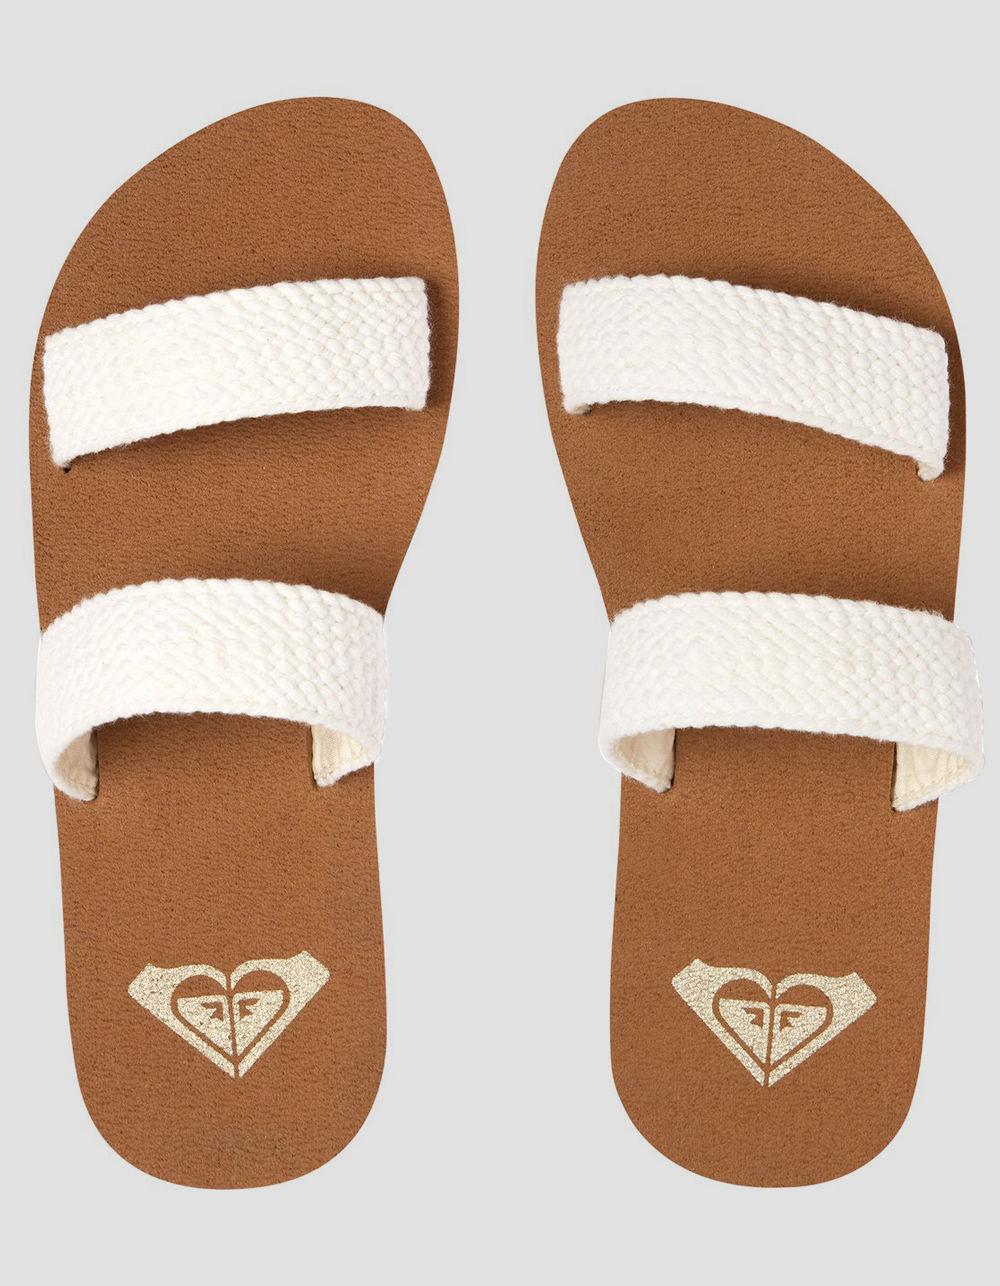 964011a69ebc25 Lyst roxy sanibel white womens sandals in white save jpg 1000x1286 Roxy  womens slippers